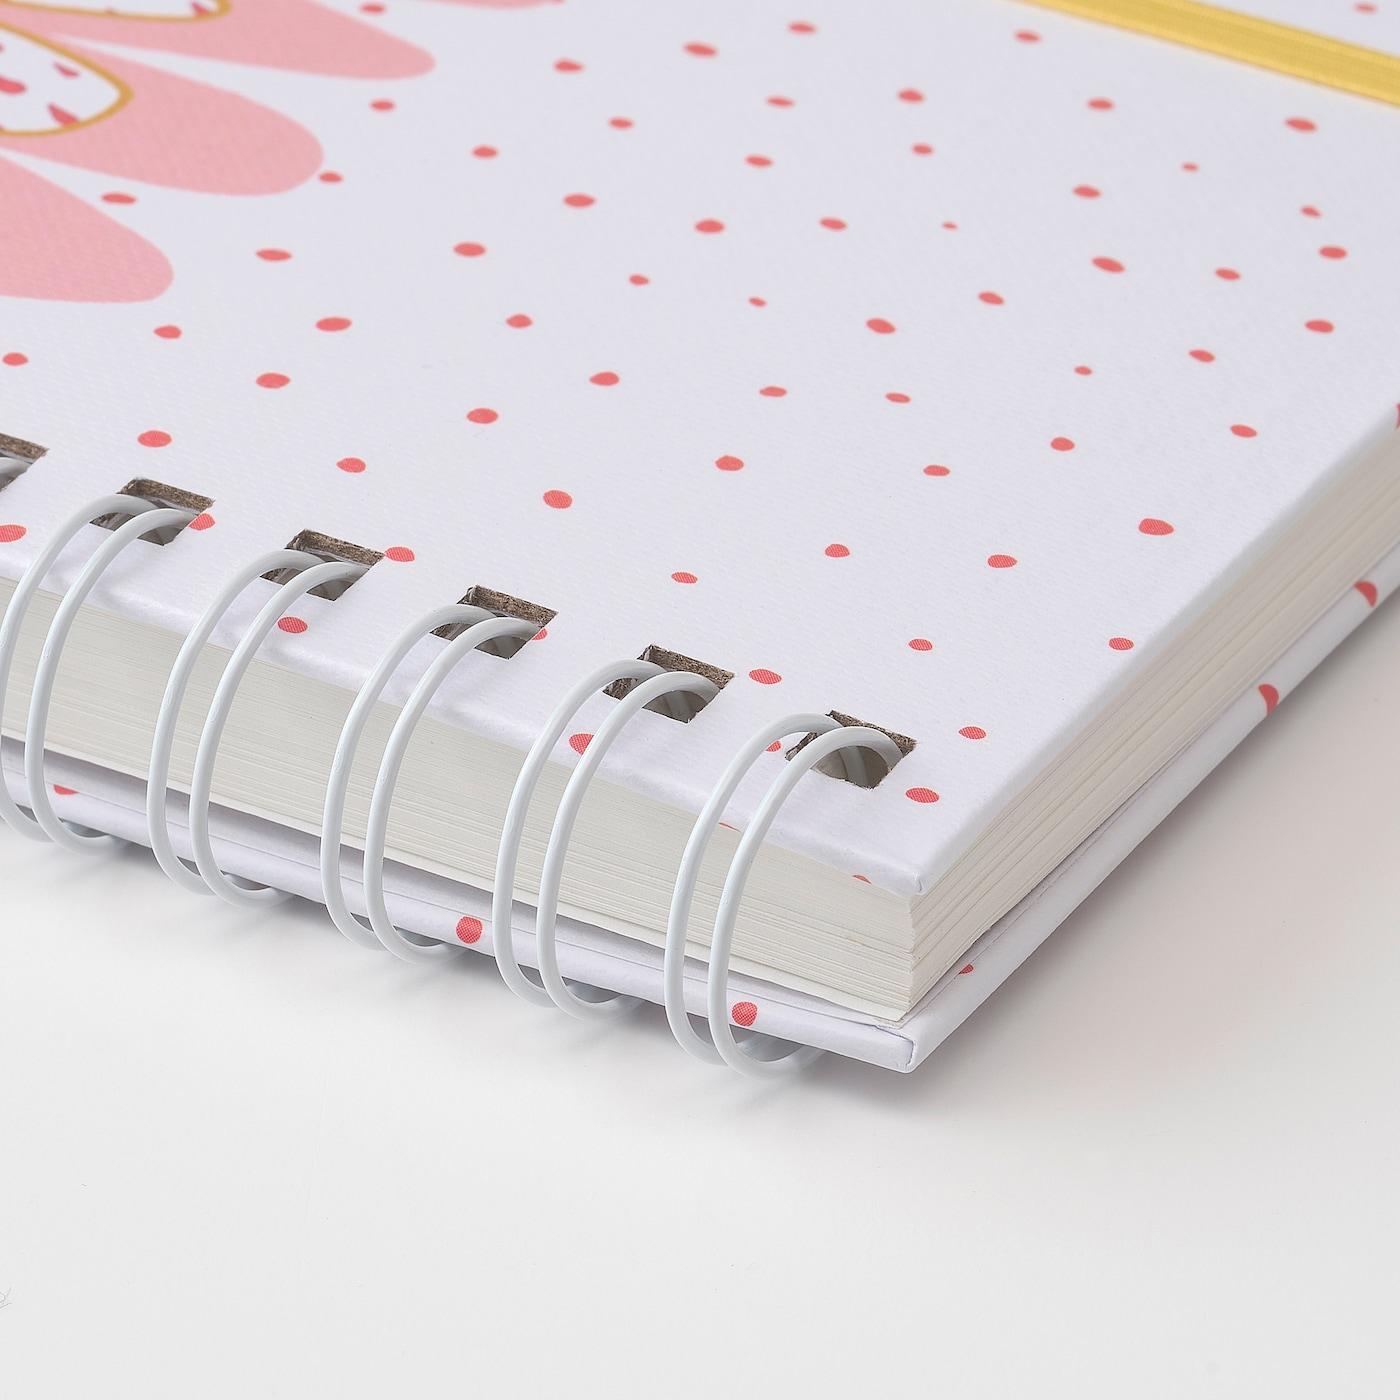 "LANKMOJ notebook white/green pink 100 pieces 7 "" 5 "" 1 "" 0 oz/sq ft"